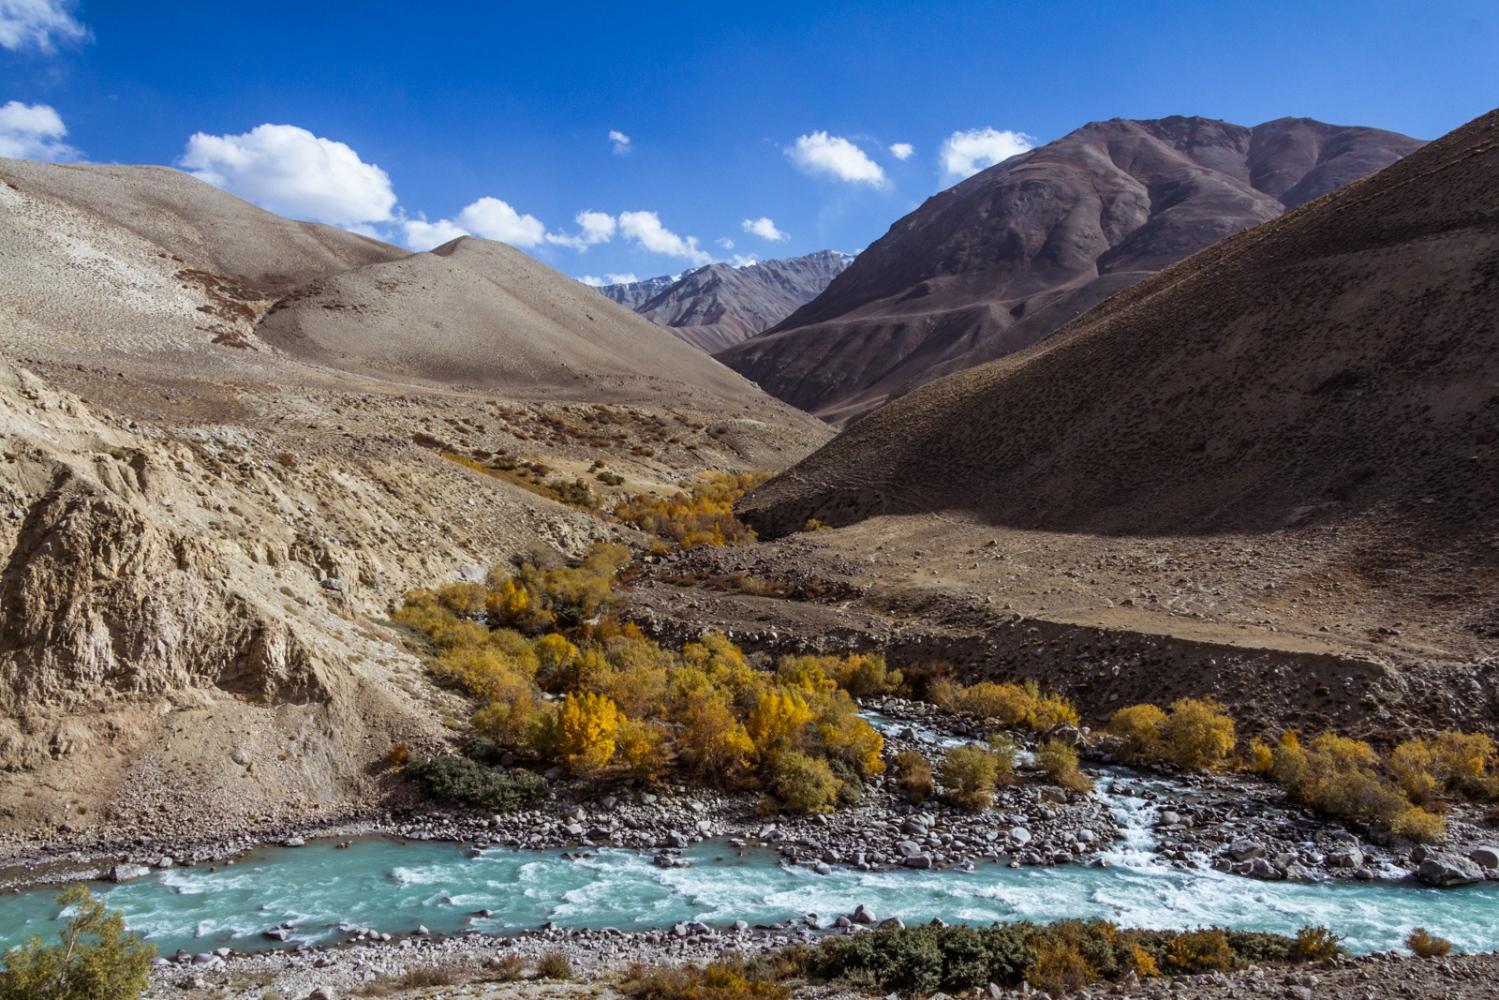 Whakhan Corridor, Afghanistan.